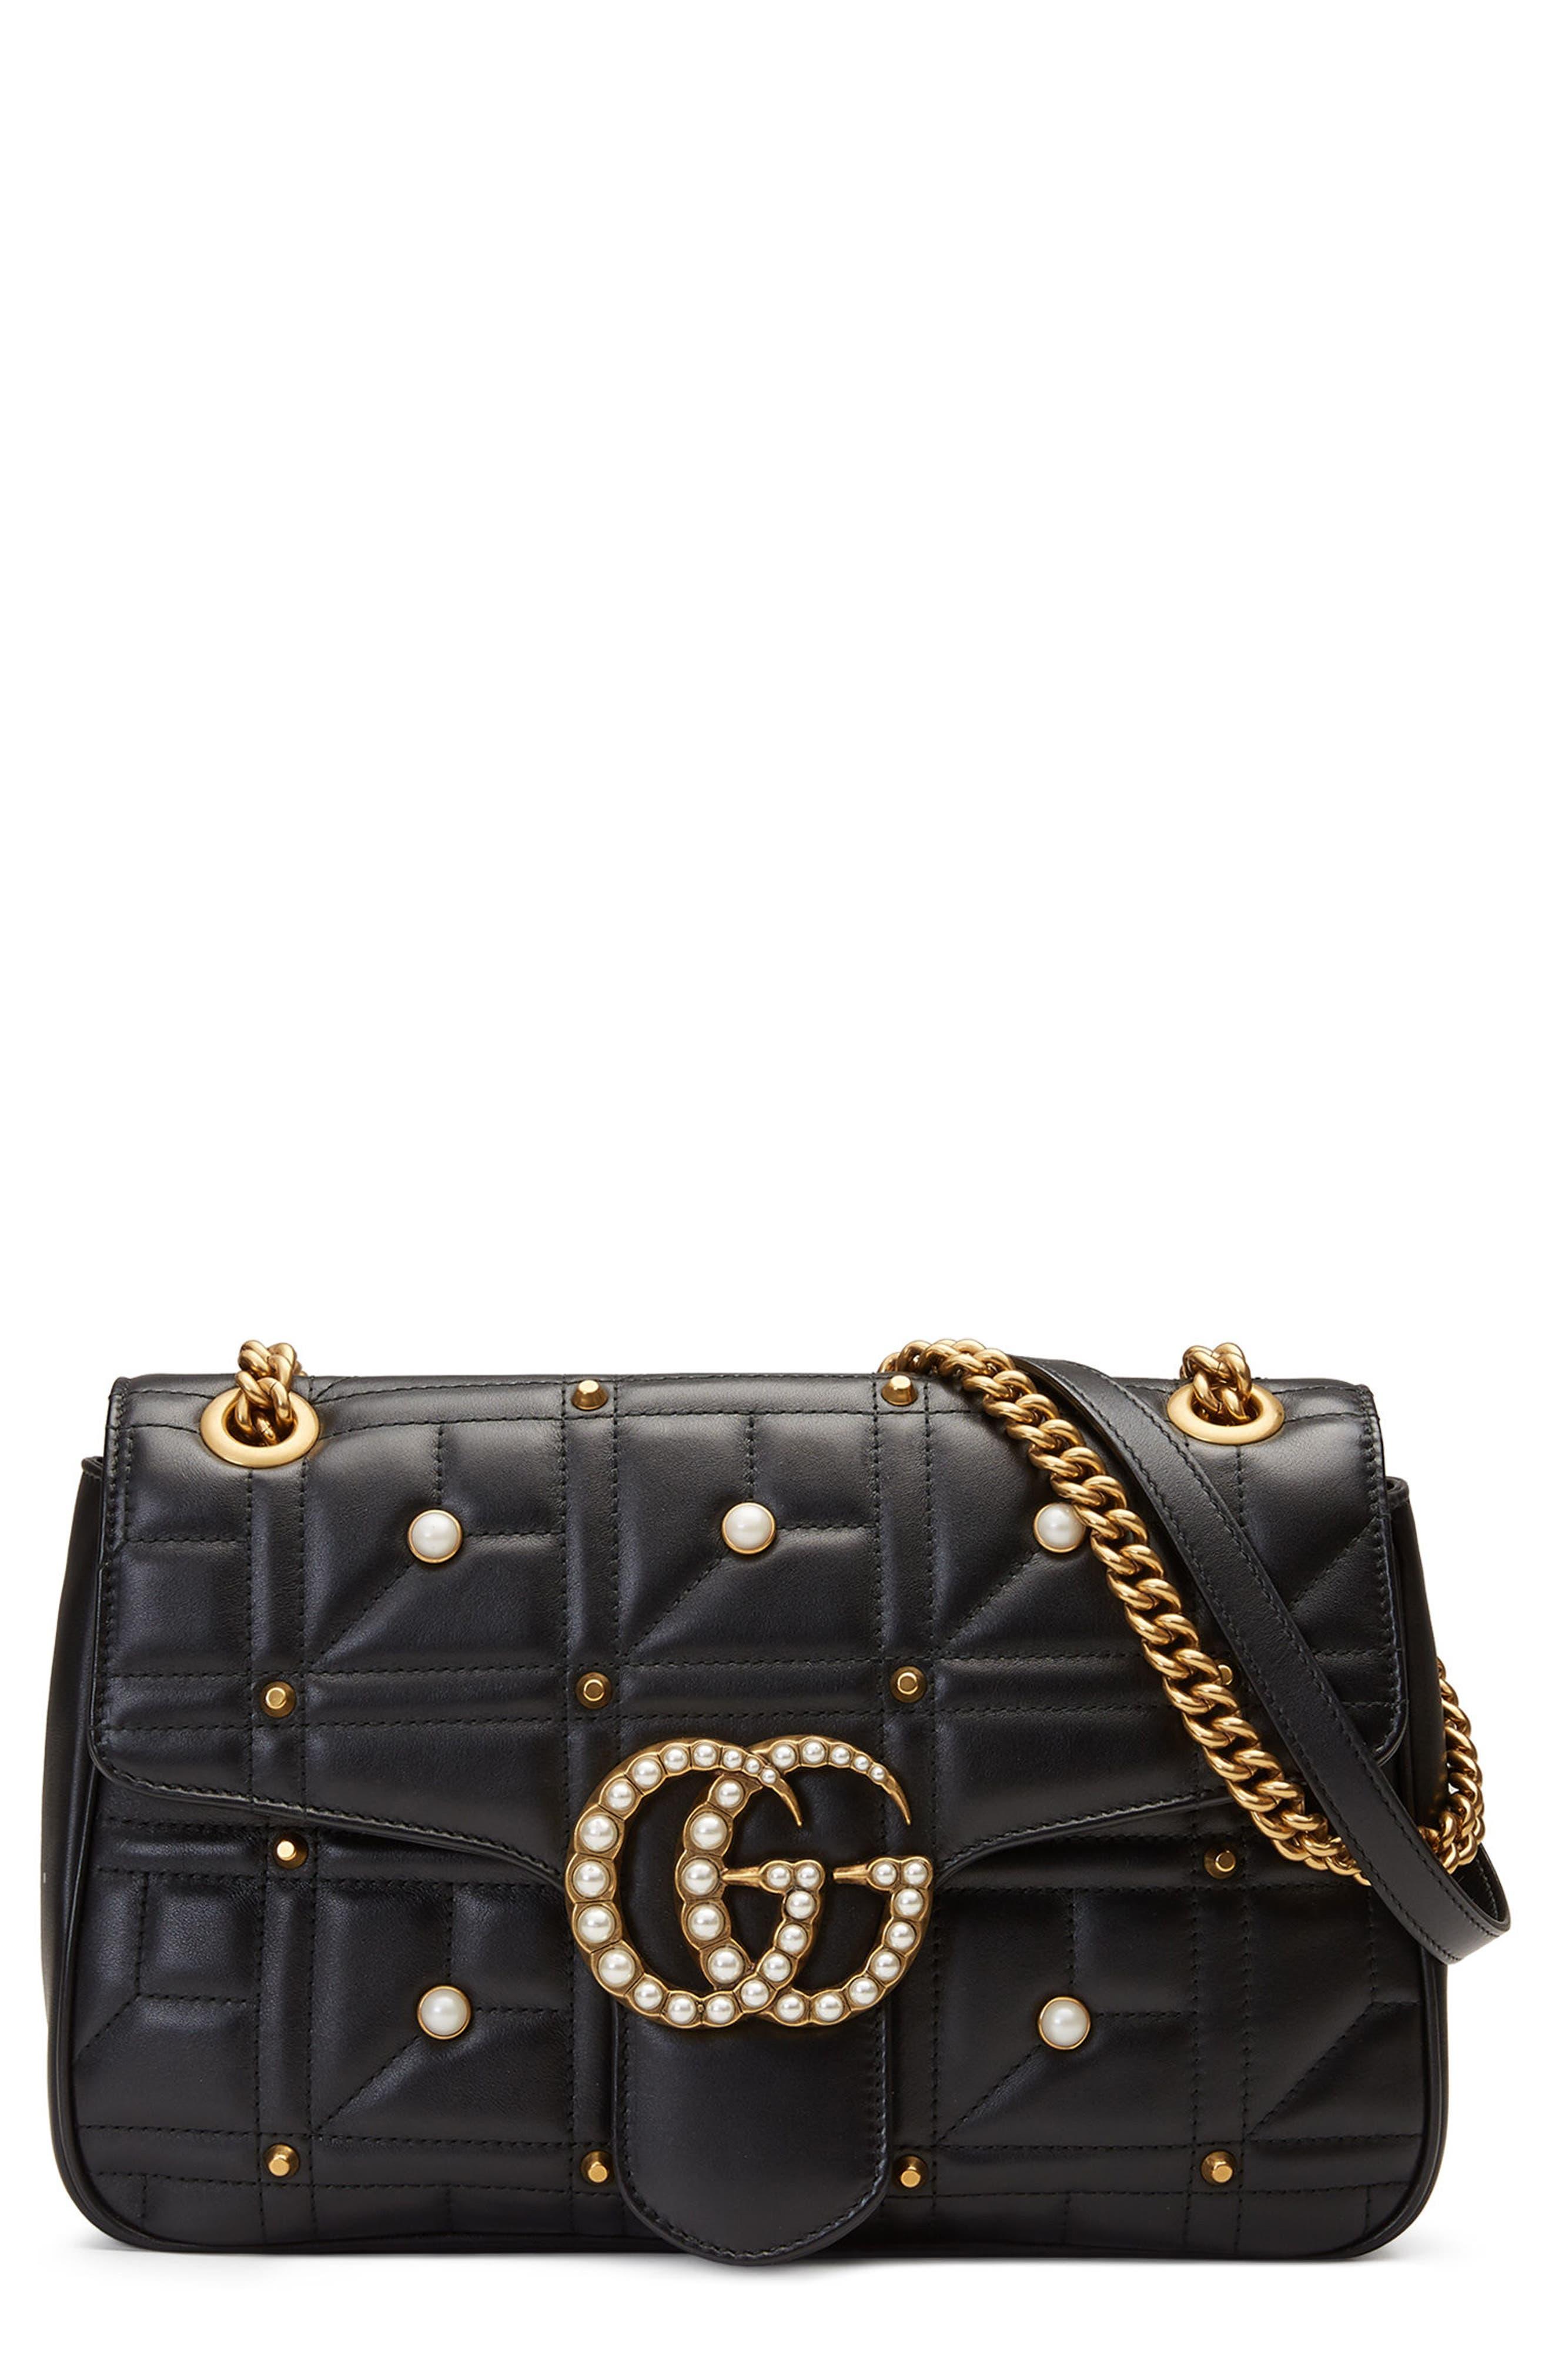 gucci bags fall 2017. gucci gg marmont 2.0 imitation pearl logo matelassé leather shoulder bag bags fall 2017